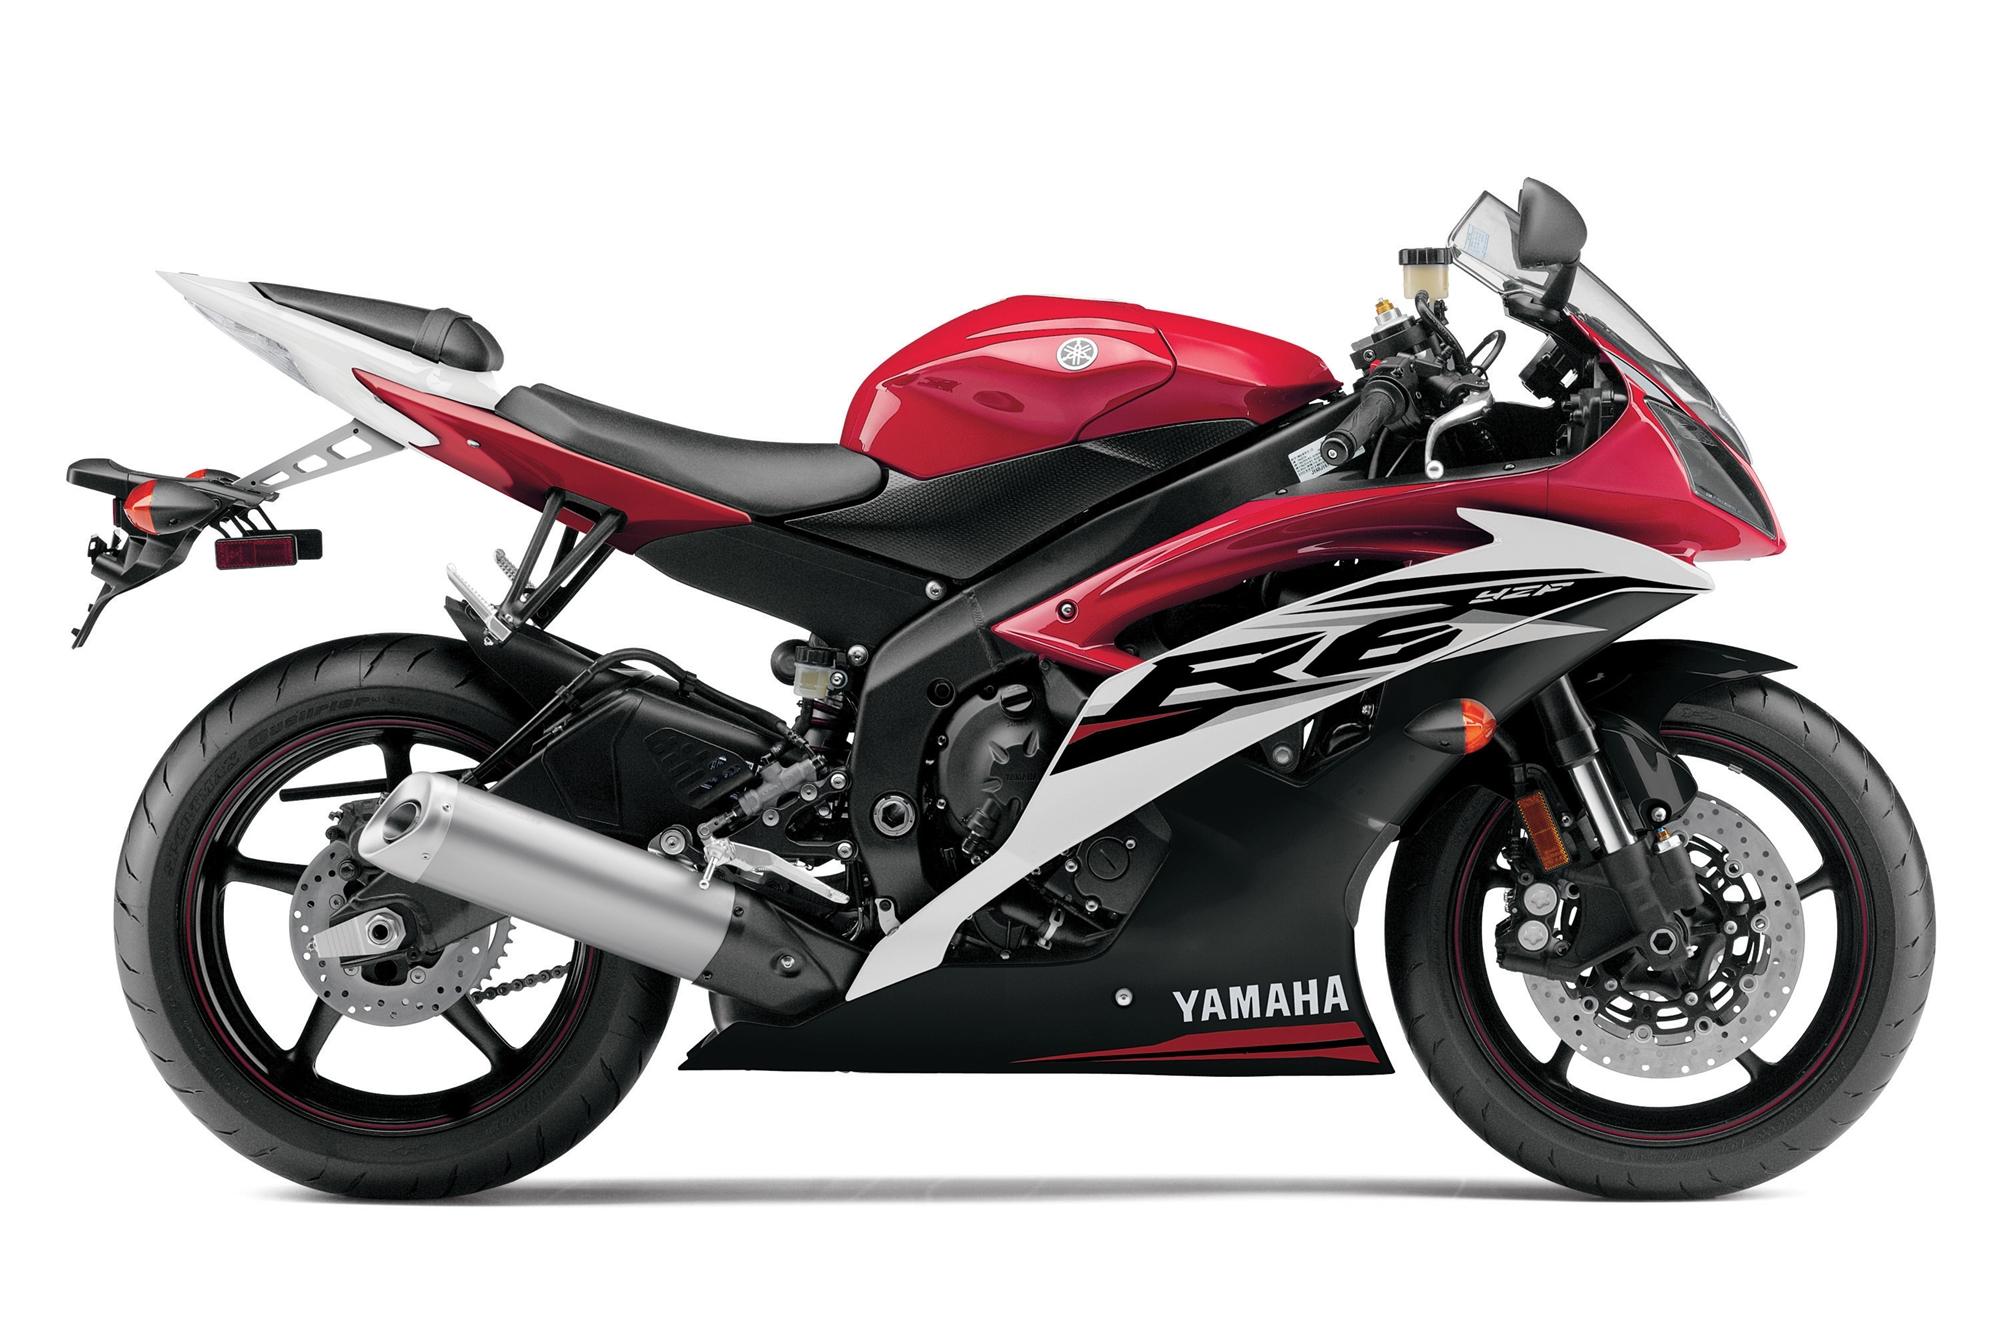 2014 Yamaha Yzf R6 Official Pics Autoevolution